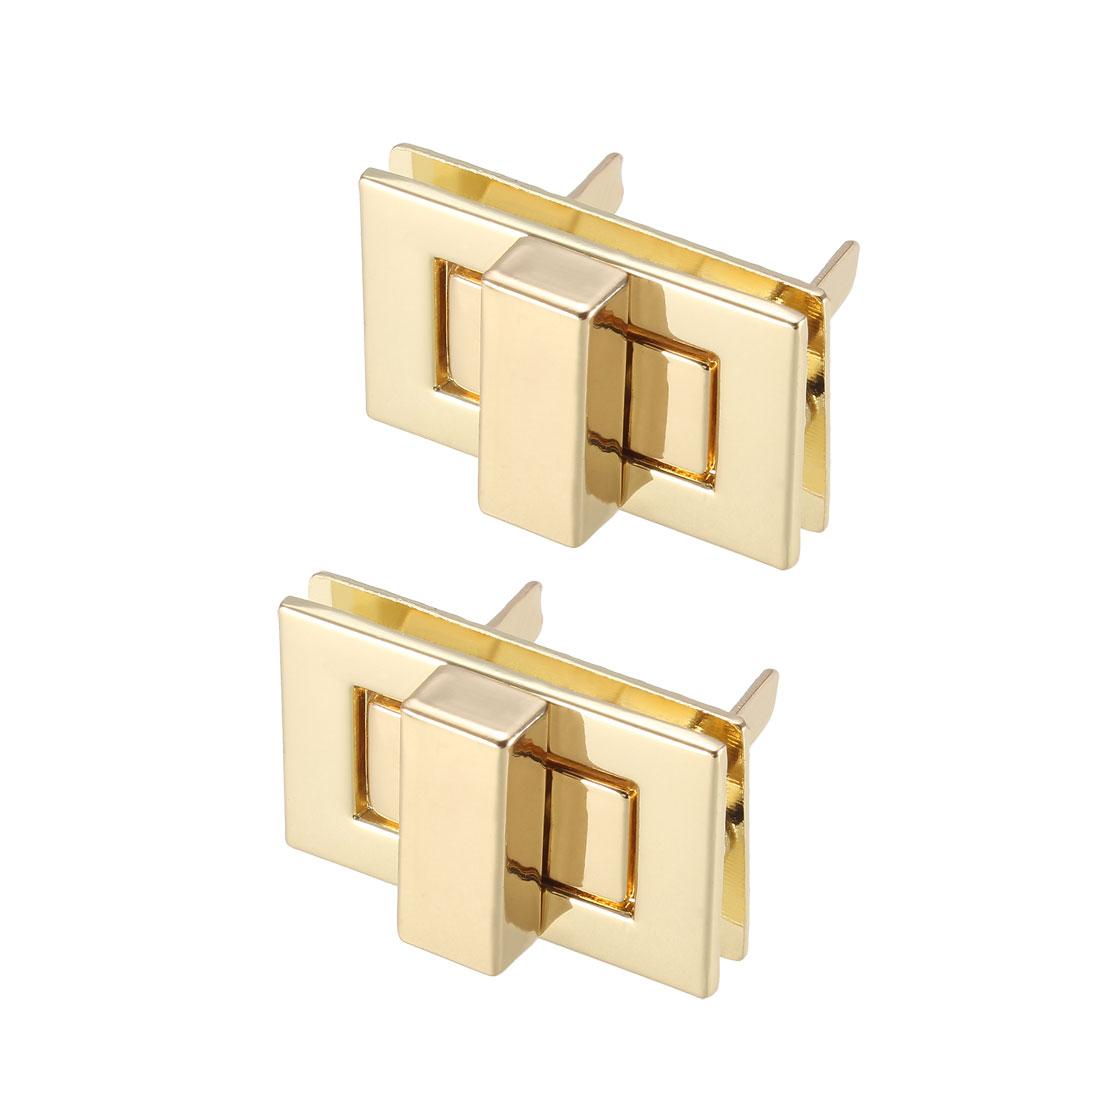 2 Sets Rectangular Purses Twist Lock 32mm x 20mm Clutches Closures - Light Gold